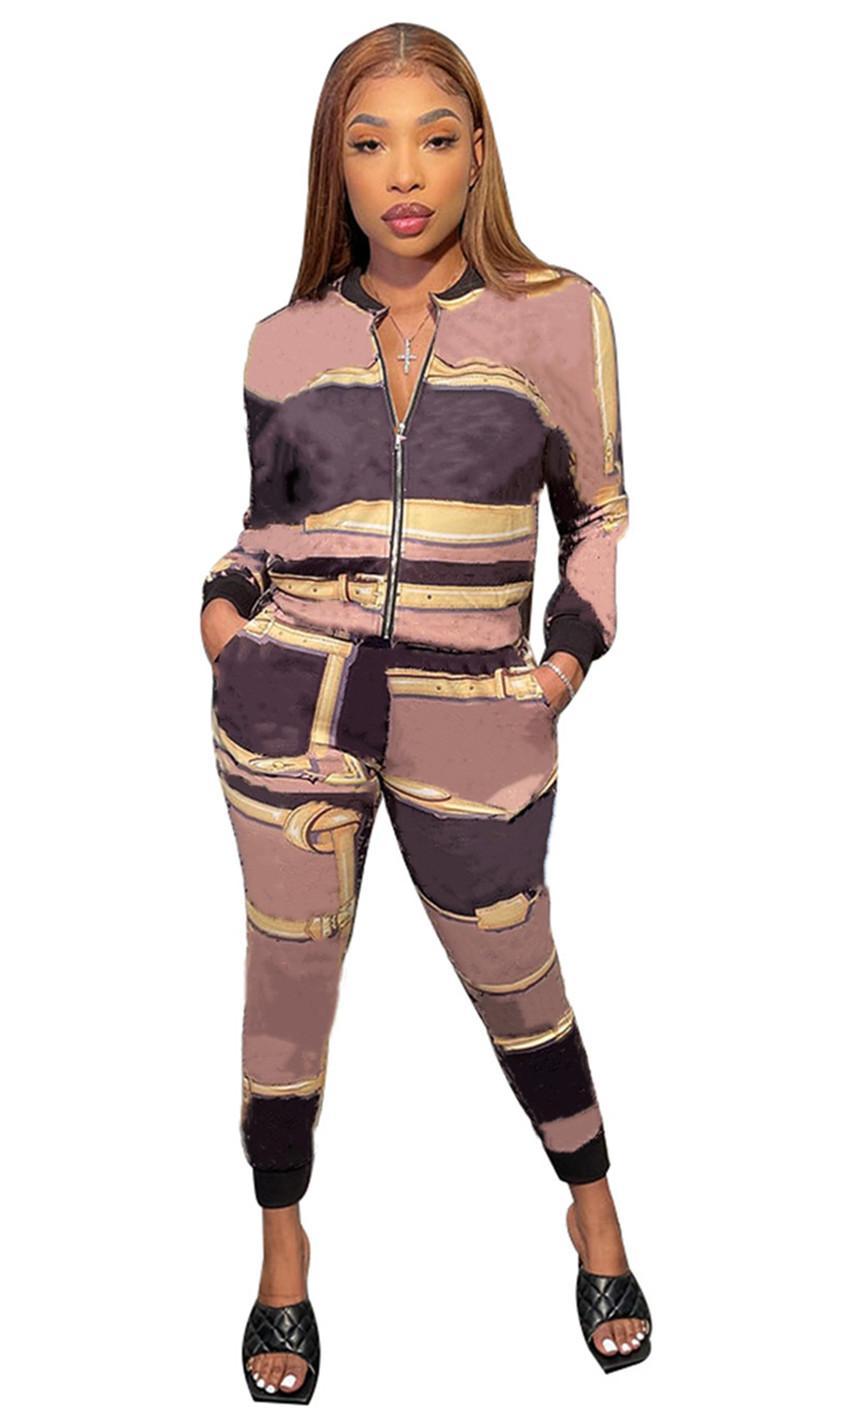 Plus Size S-2XL Womens Casual Trainingsanzüge Weibliche Outfits Brief Sweatsheilkunde Jacke Zwei Teile Sets Sommer Kleidung Sport Jogger Anzug Mantel + Leggings 4752